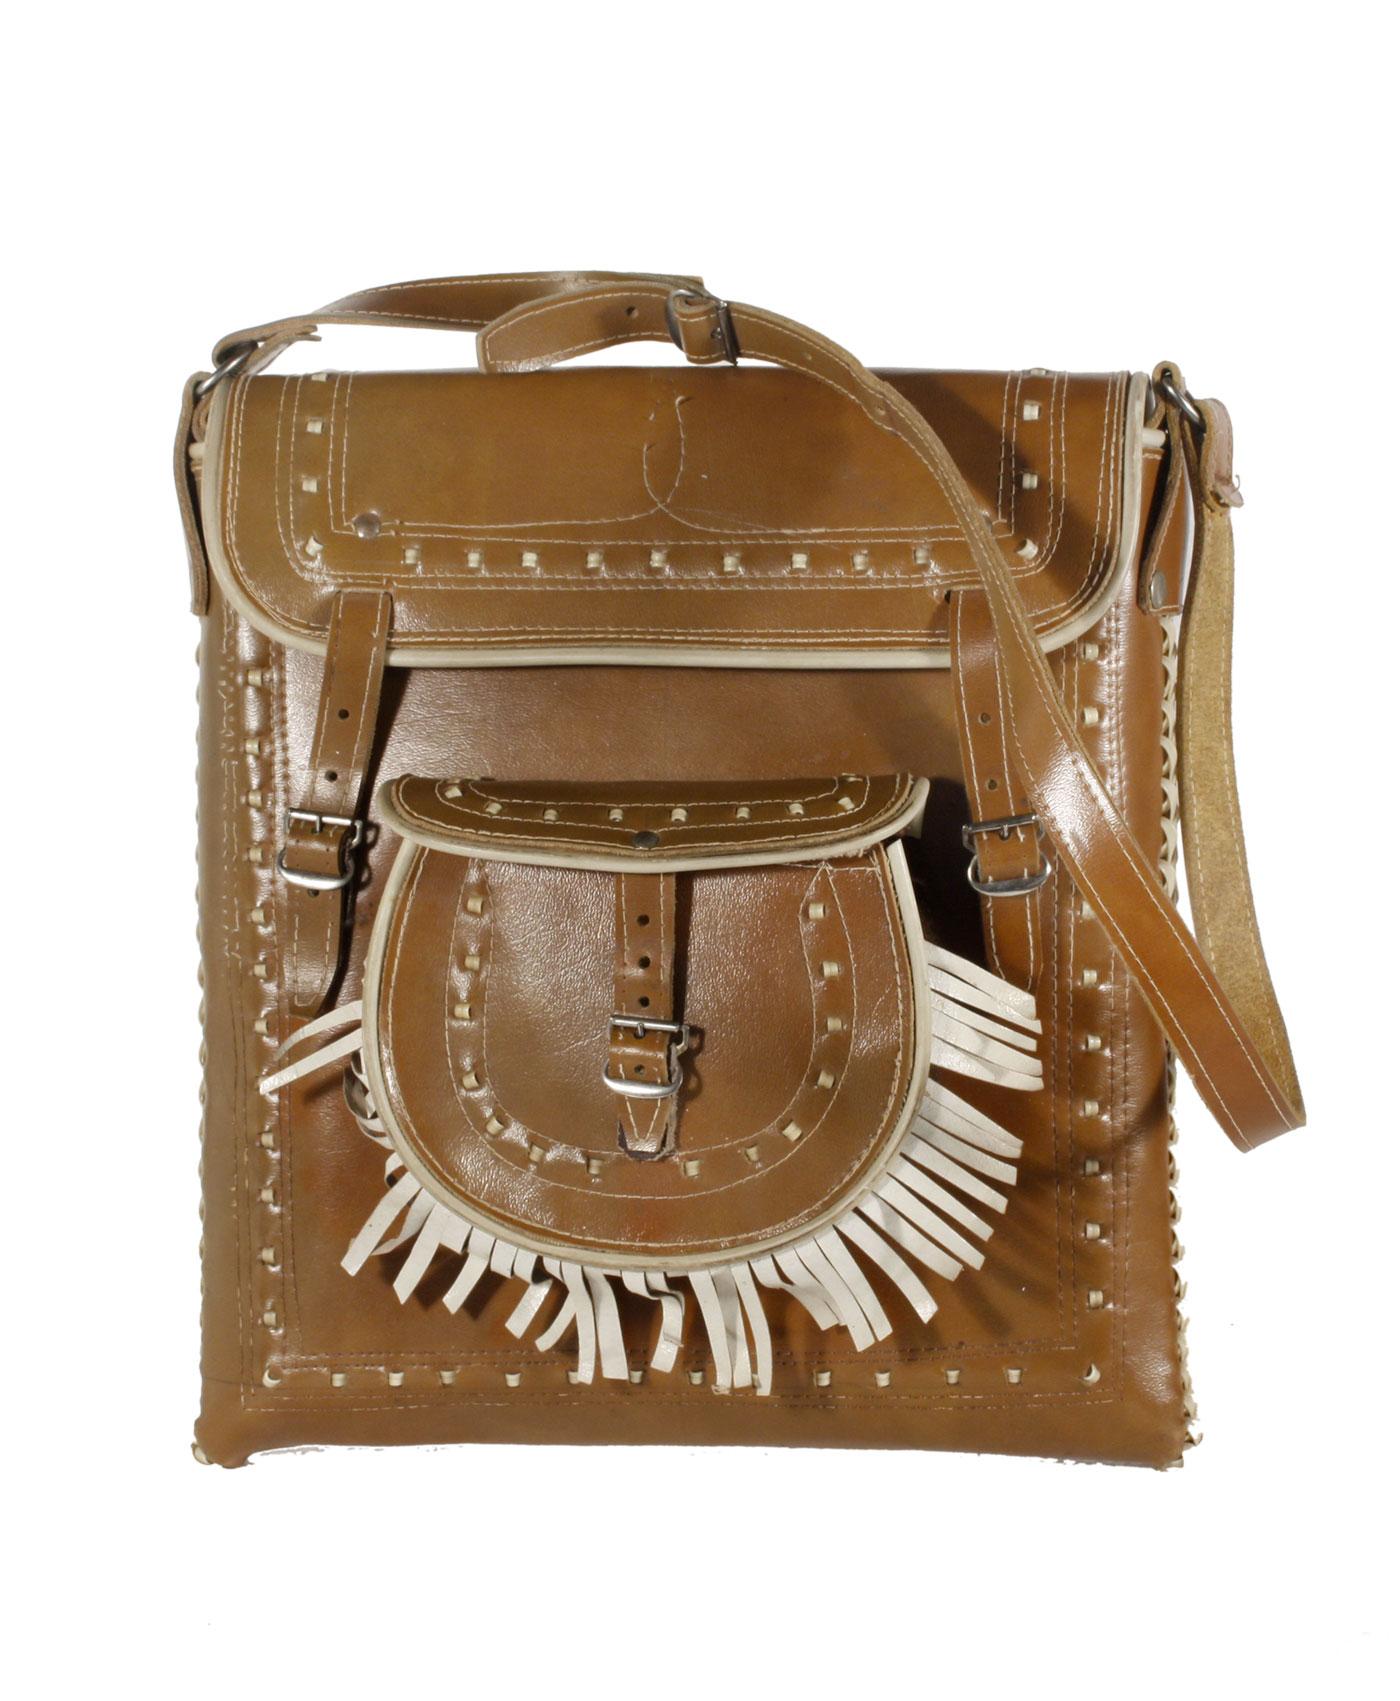 Bohemian leather bag